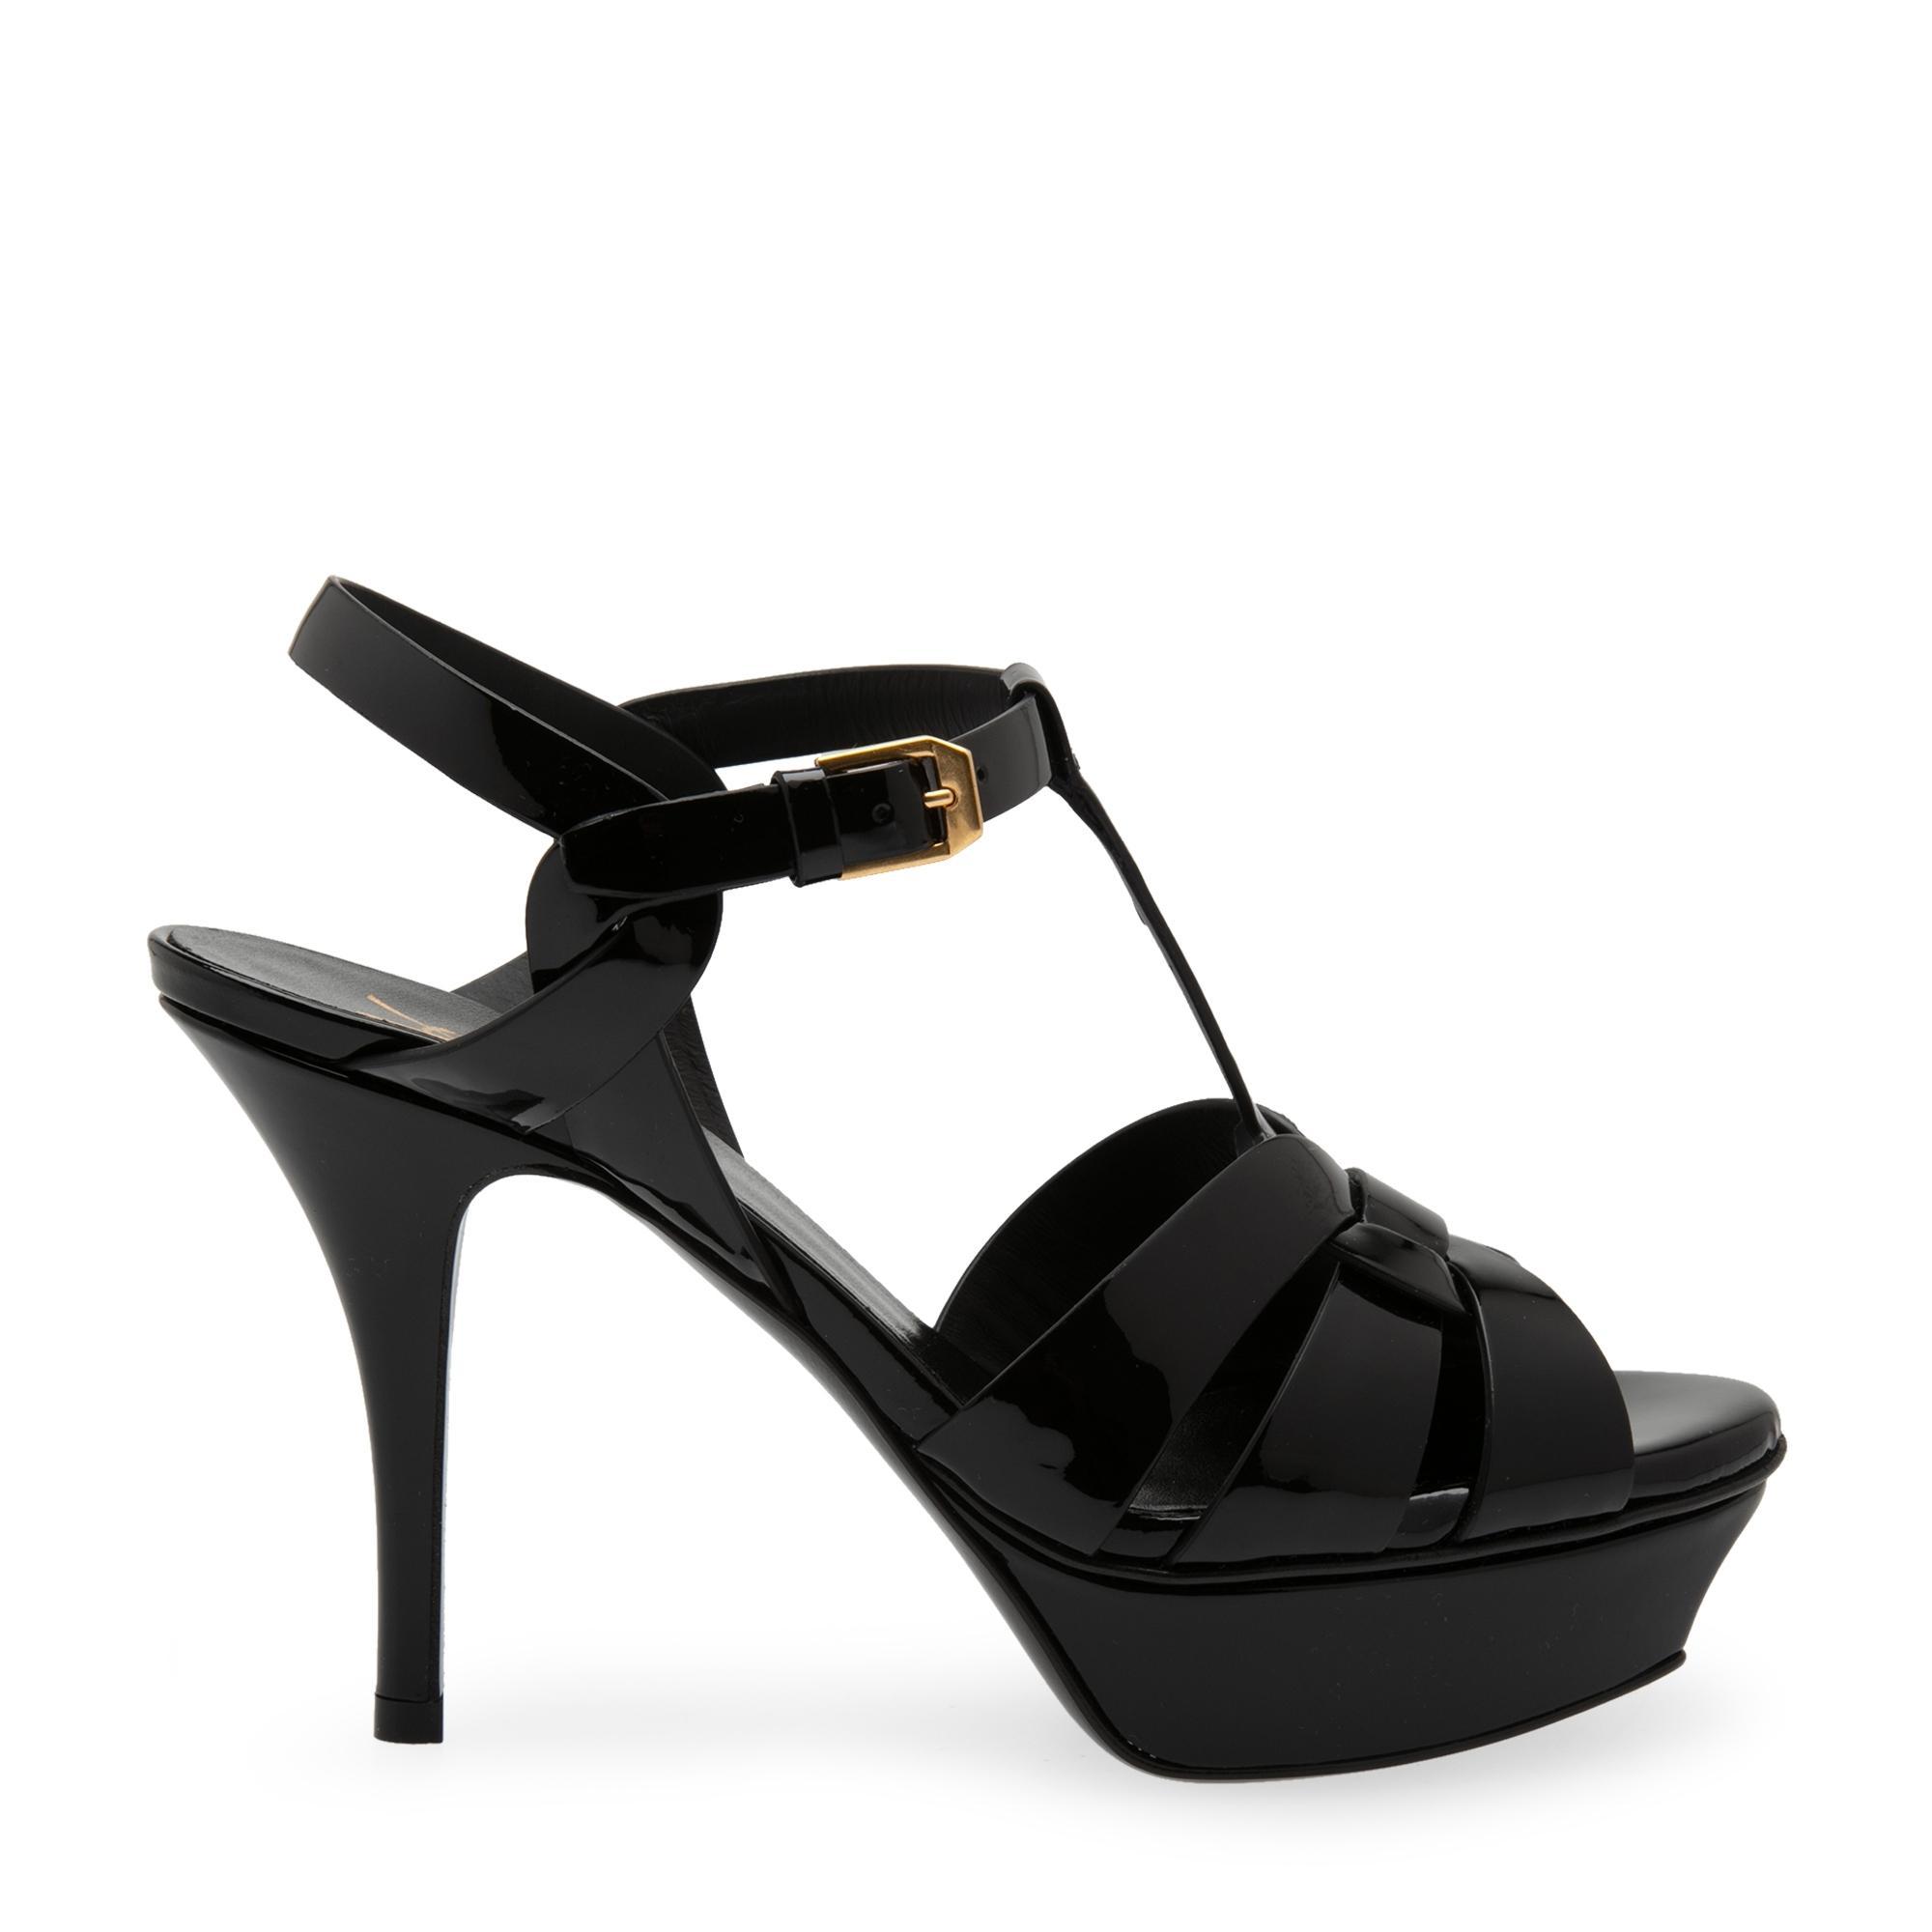 Tribute platform sandals